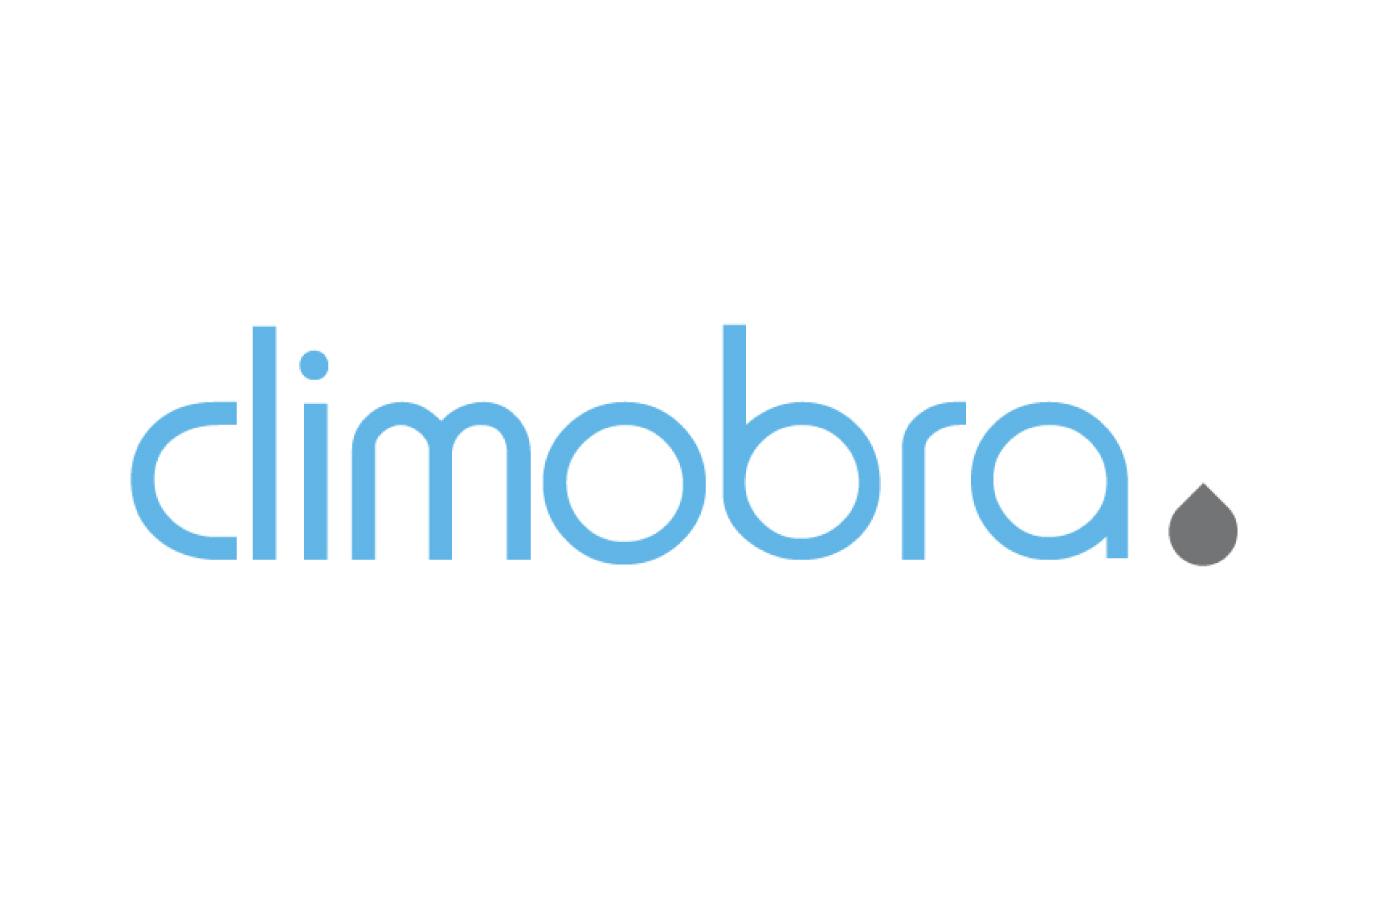 climobra_new-06